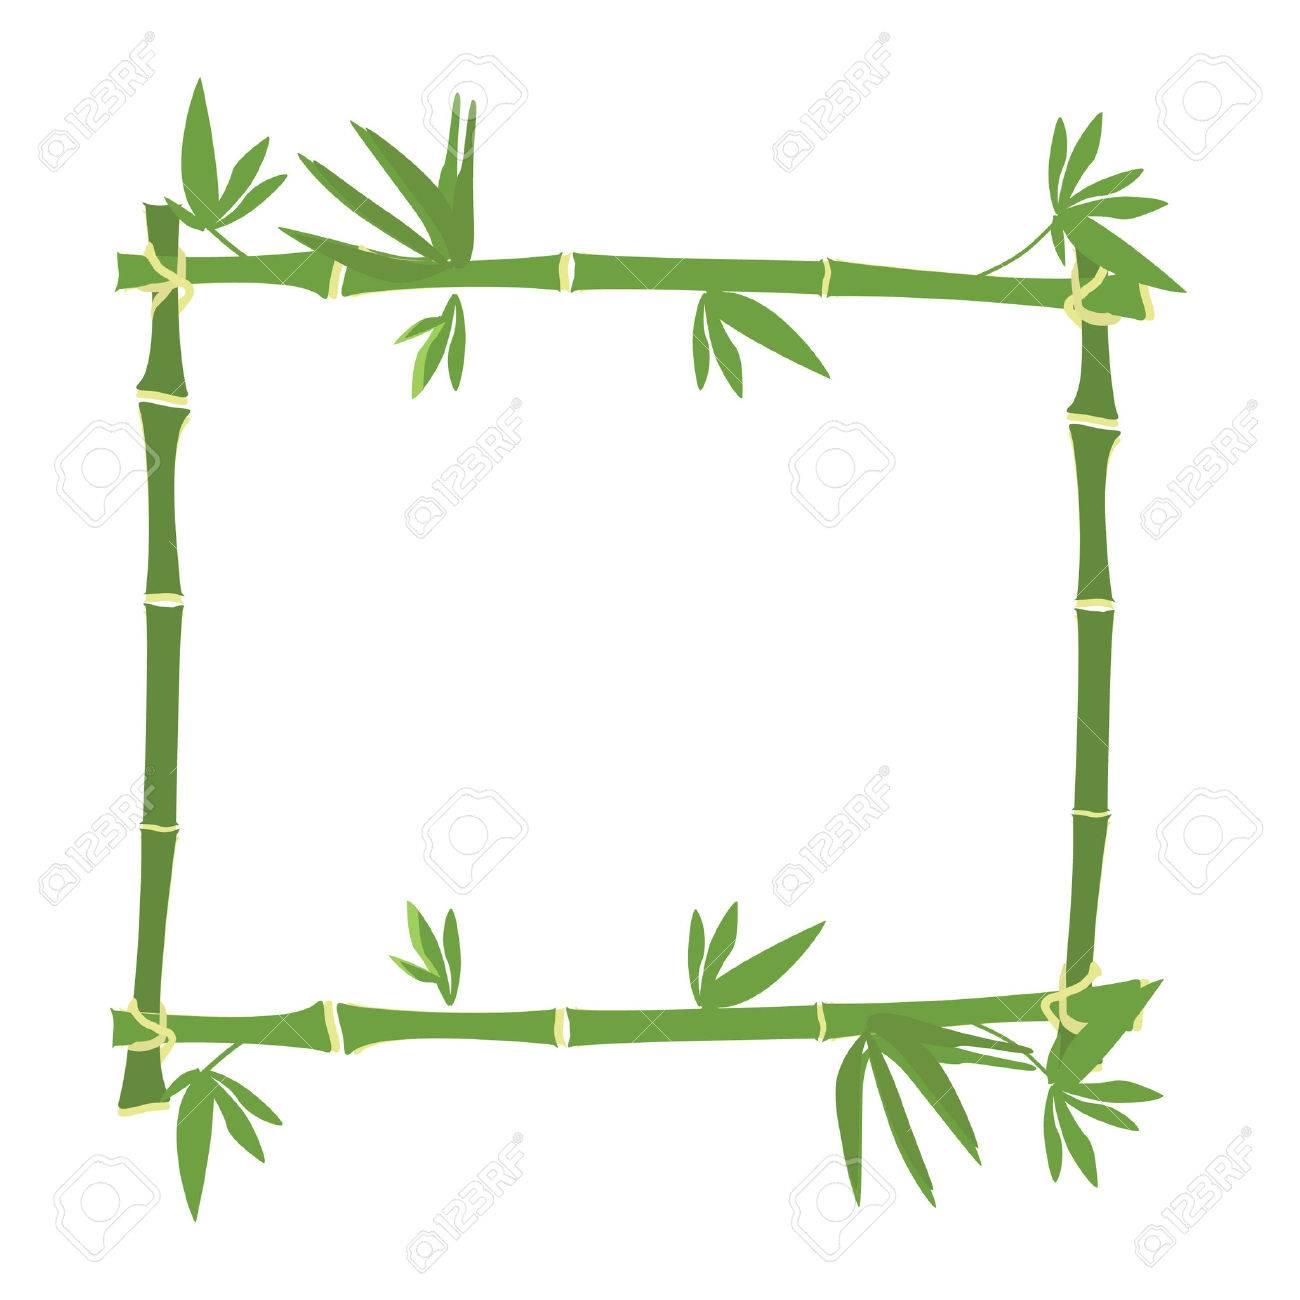 Bambus-Rahmen, Bambus Grenze Raster, Grüner Bambus Lizenzfreie Fotos ...